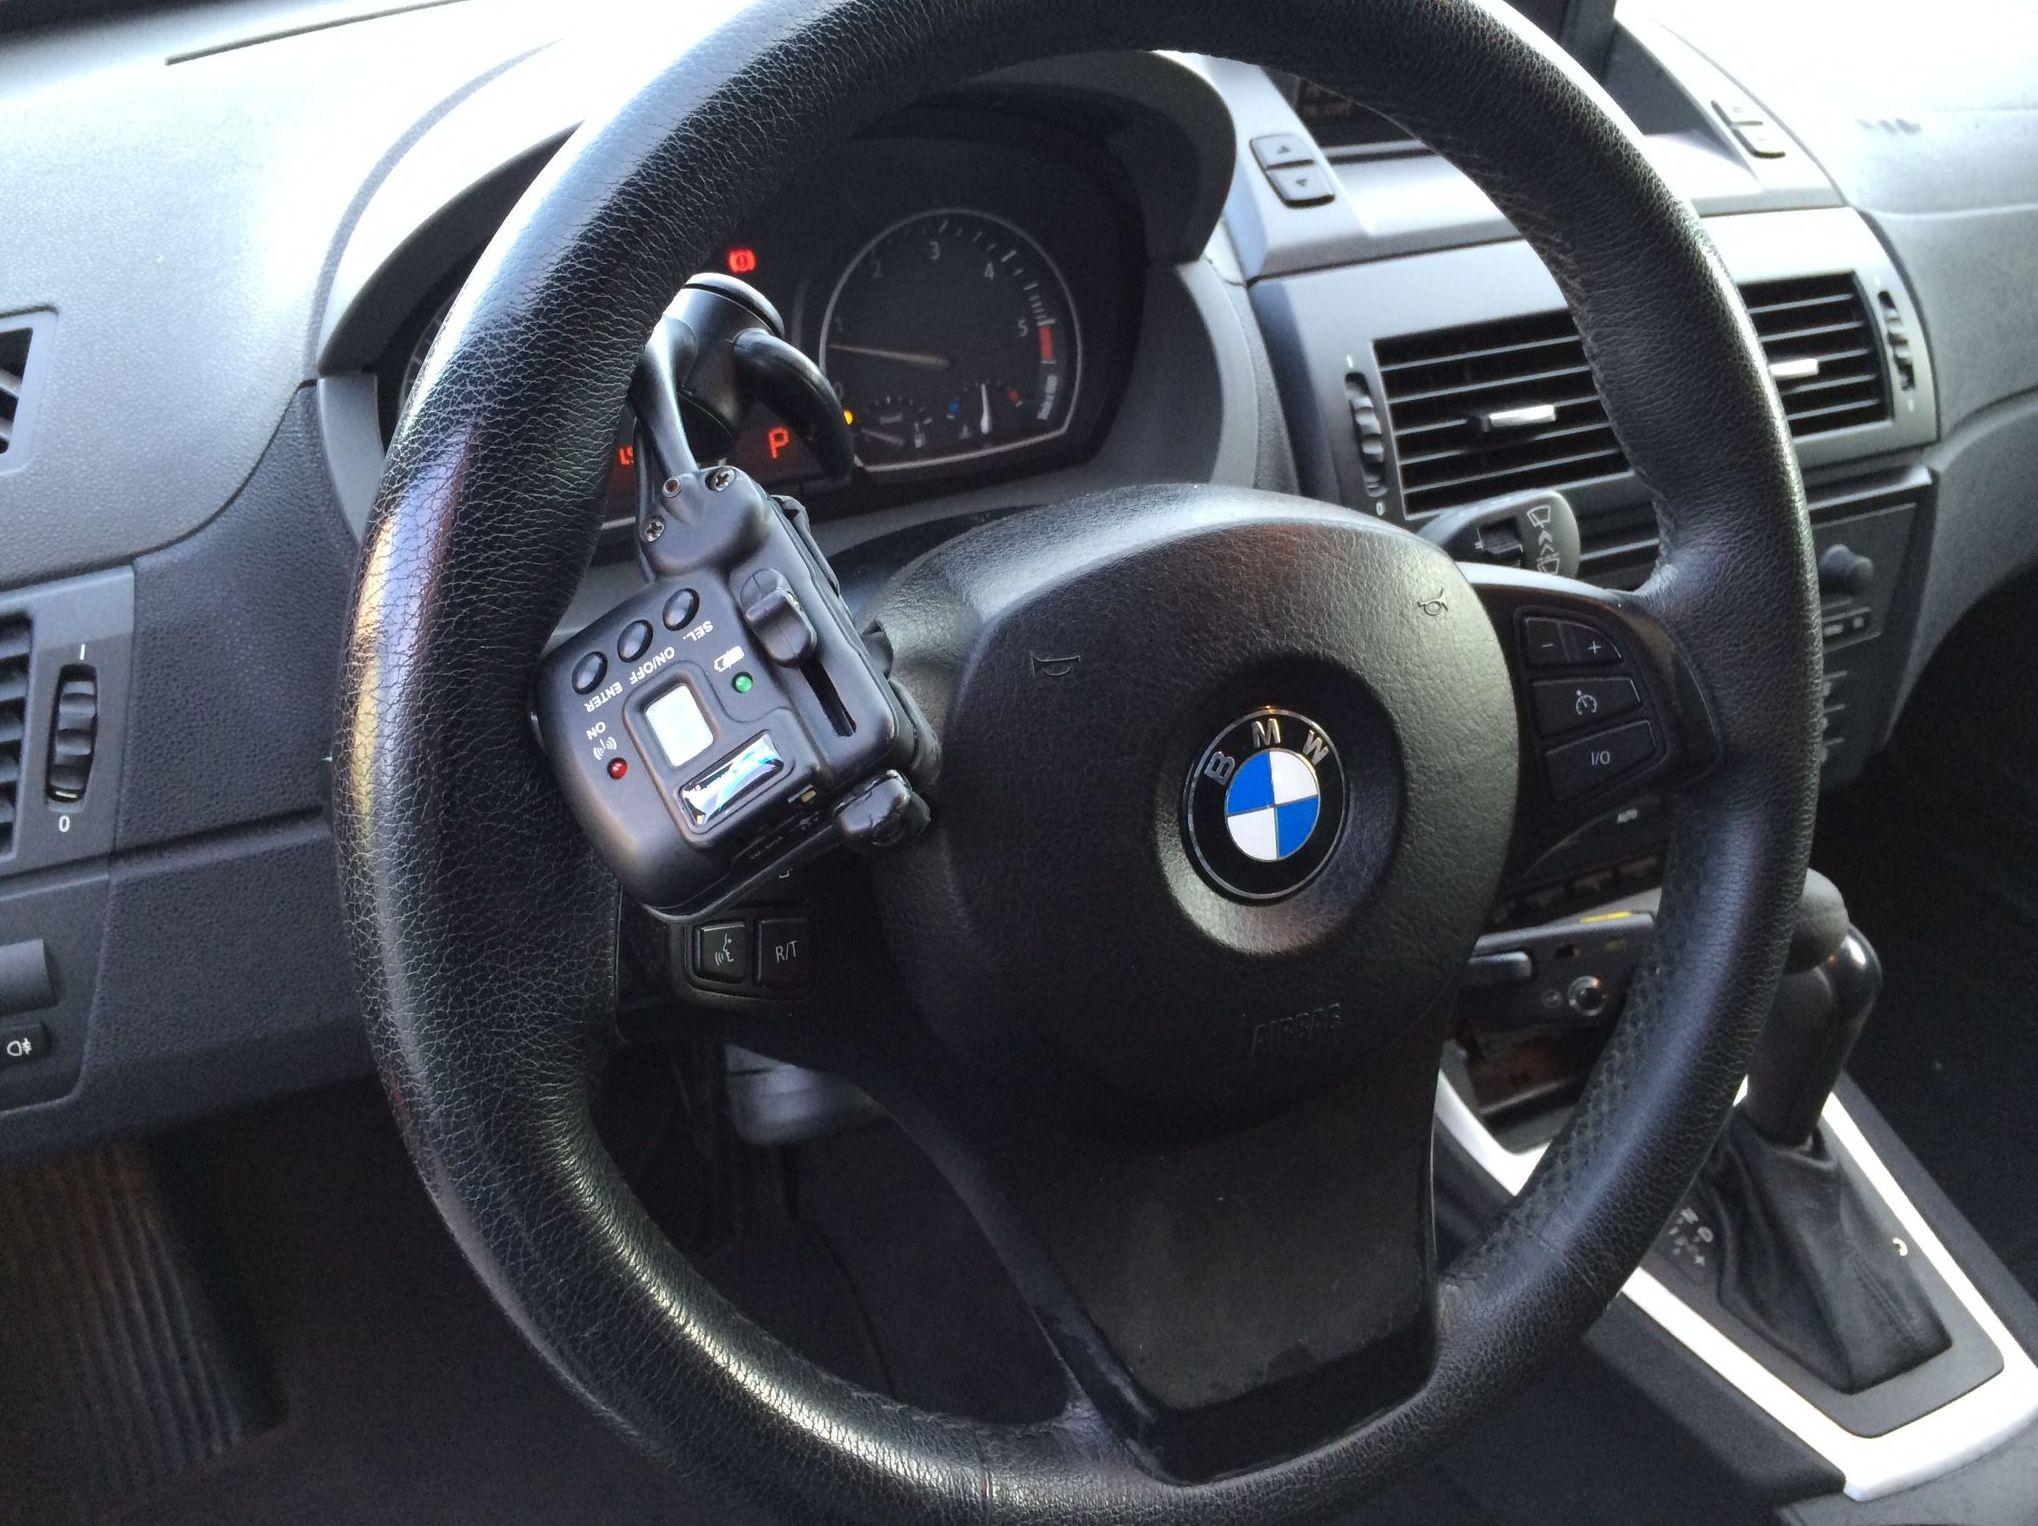 Cabal Automoción Bosch Car Service. Adaptacion de vehículos en Avilés